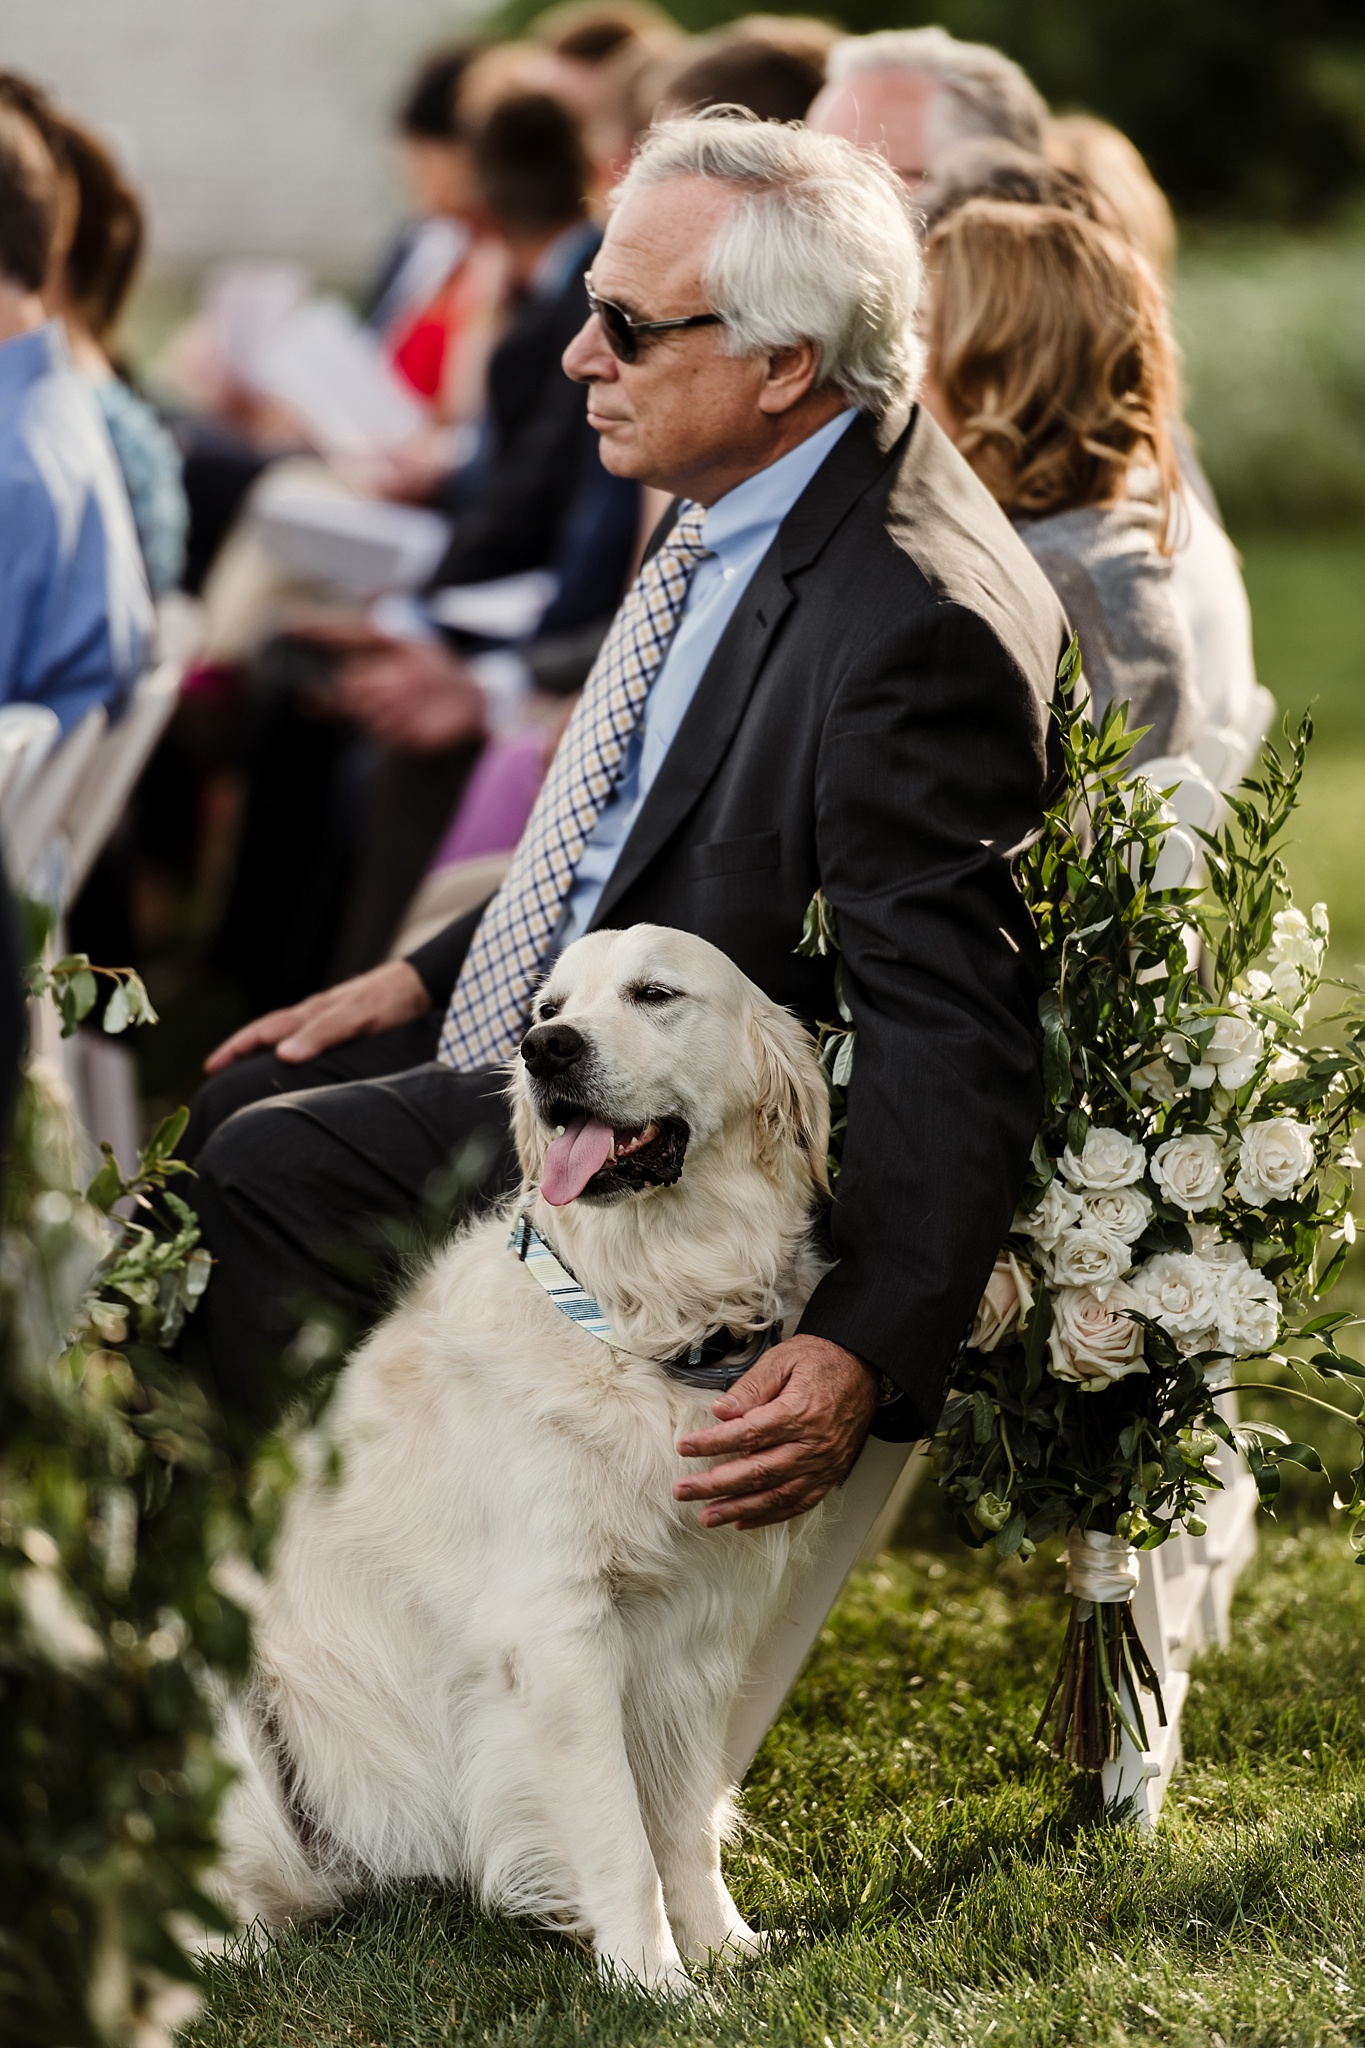 hudson_valley_wedding_1798.jpg